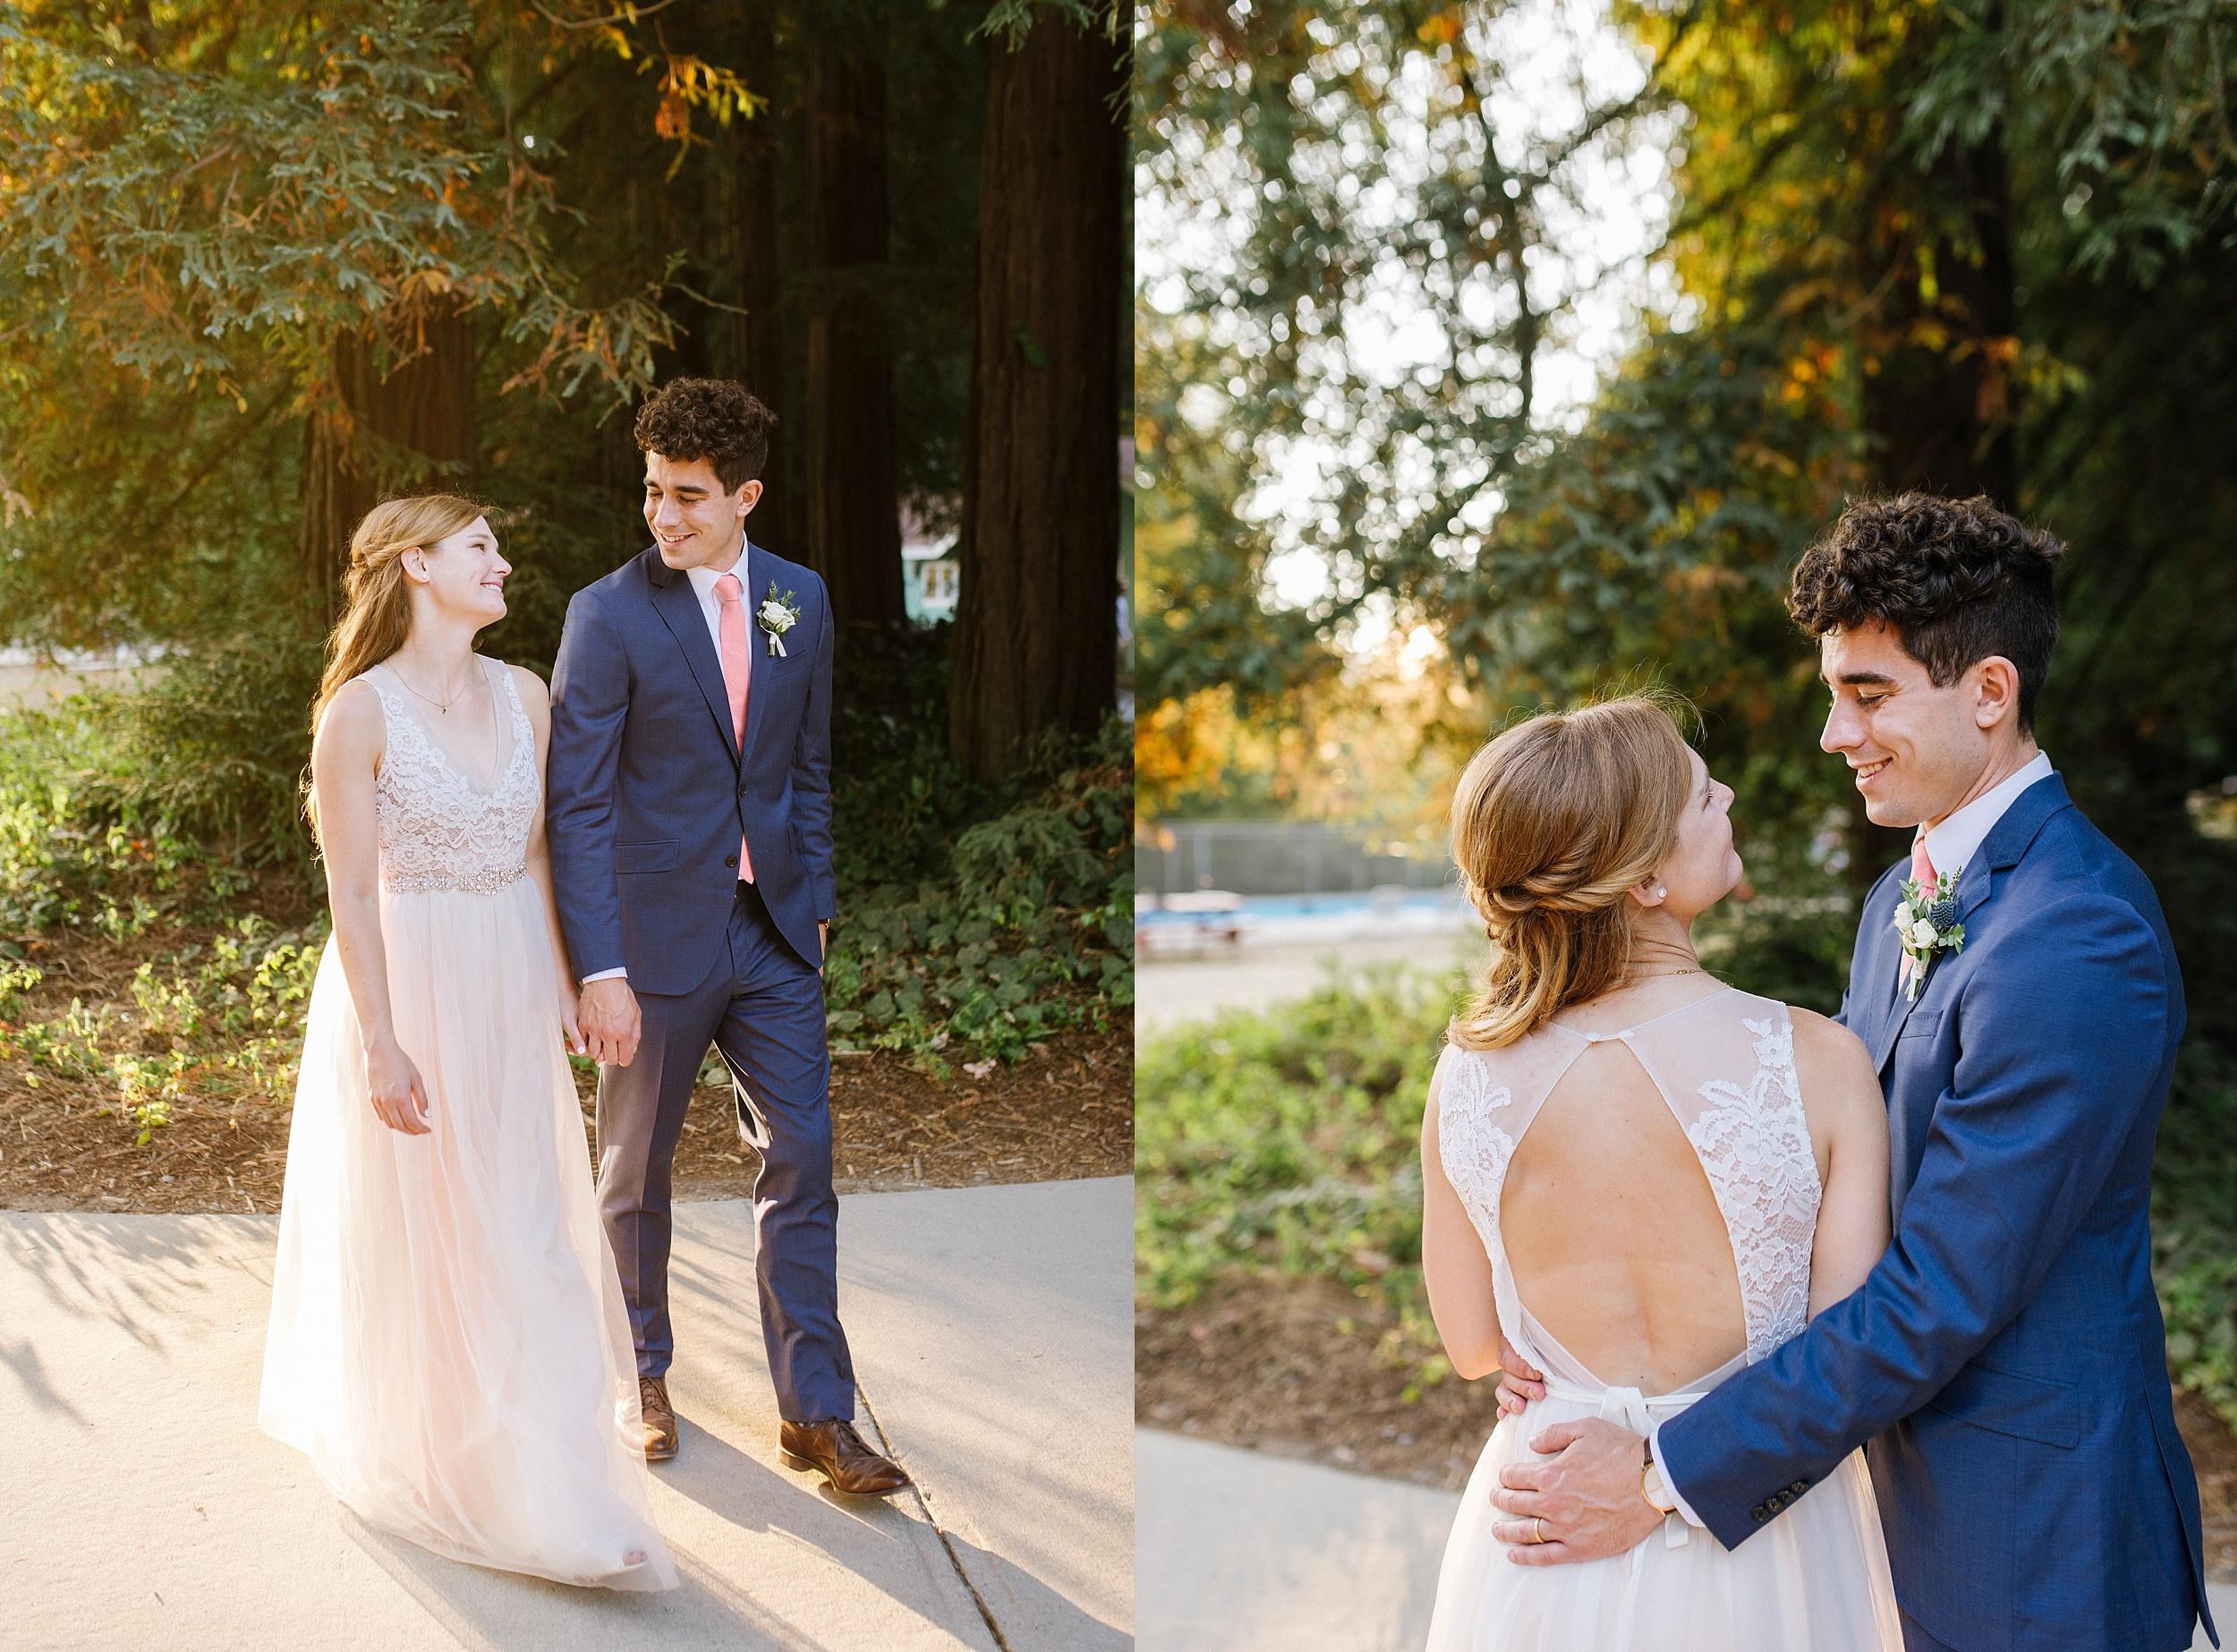 Amphitheatre-of-the-Redwoods-wedding-erikariley_chelsea-dier-photography_0038.jpg